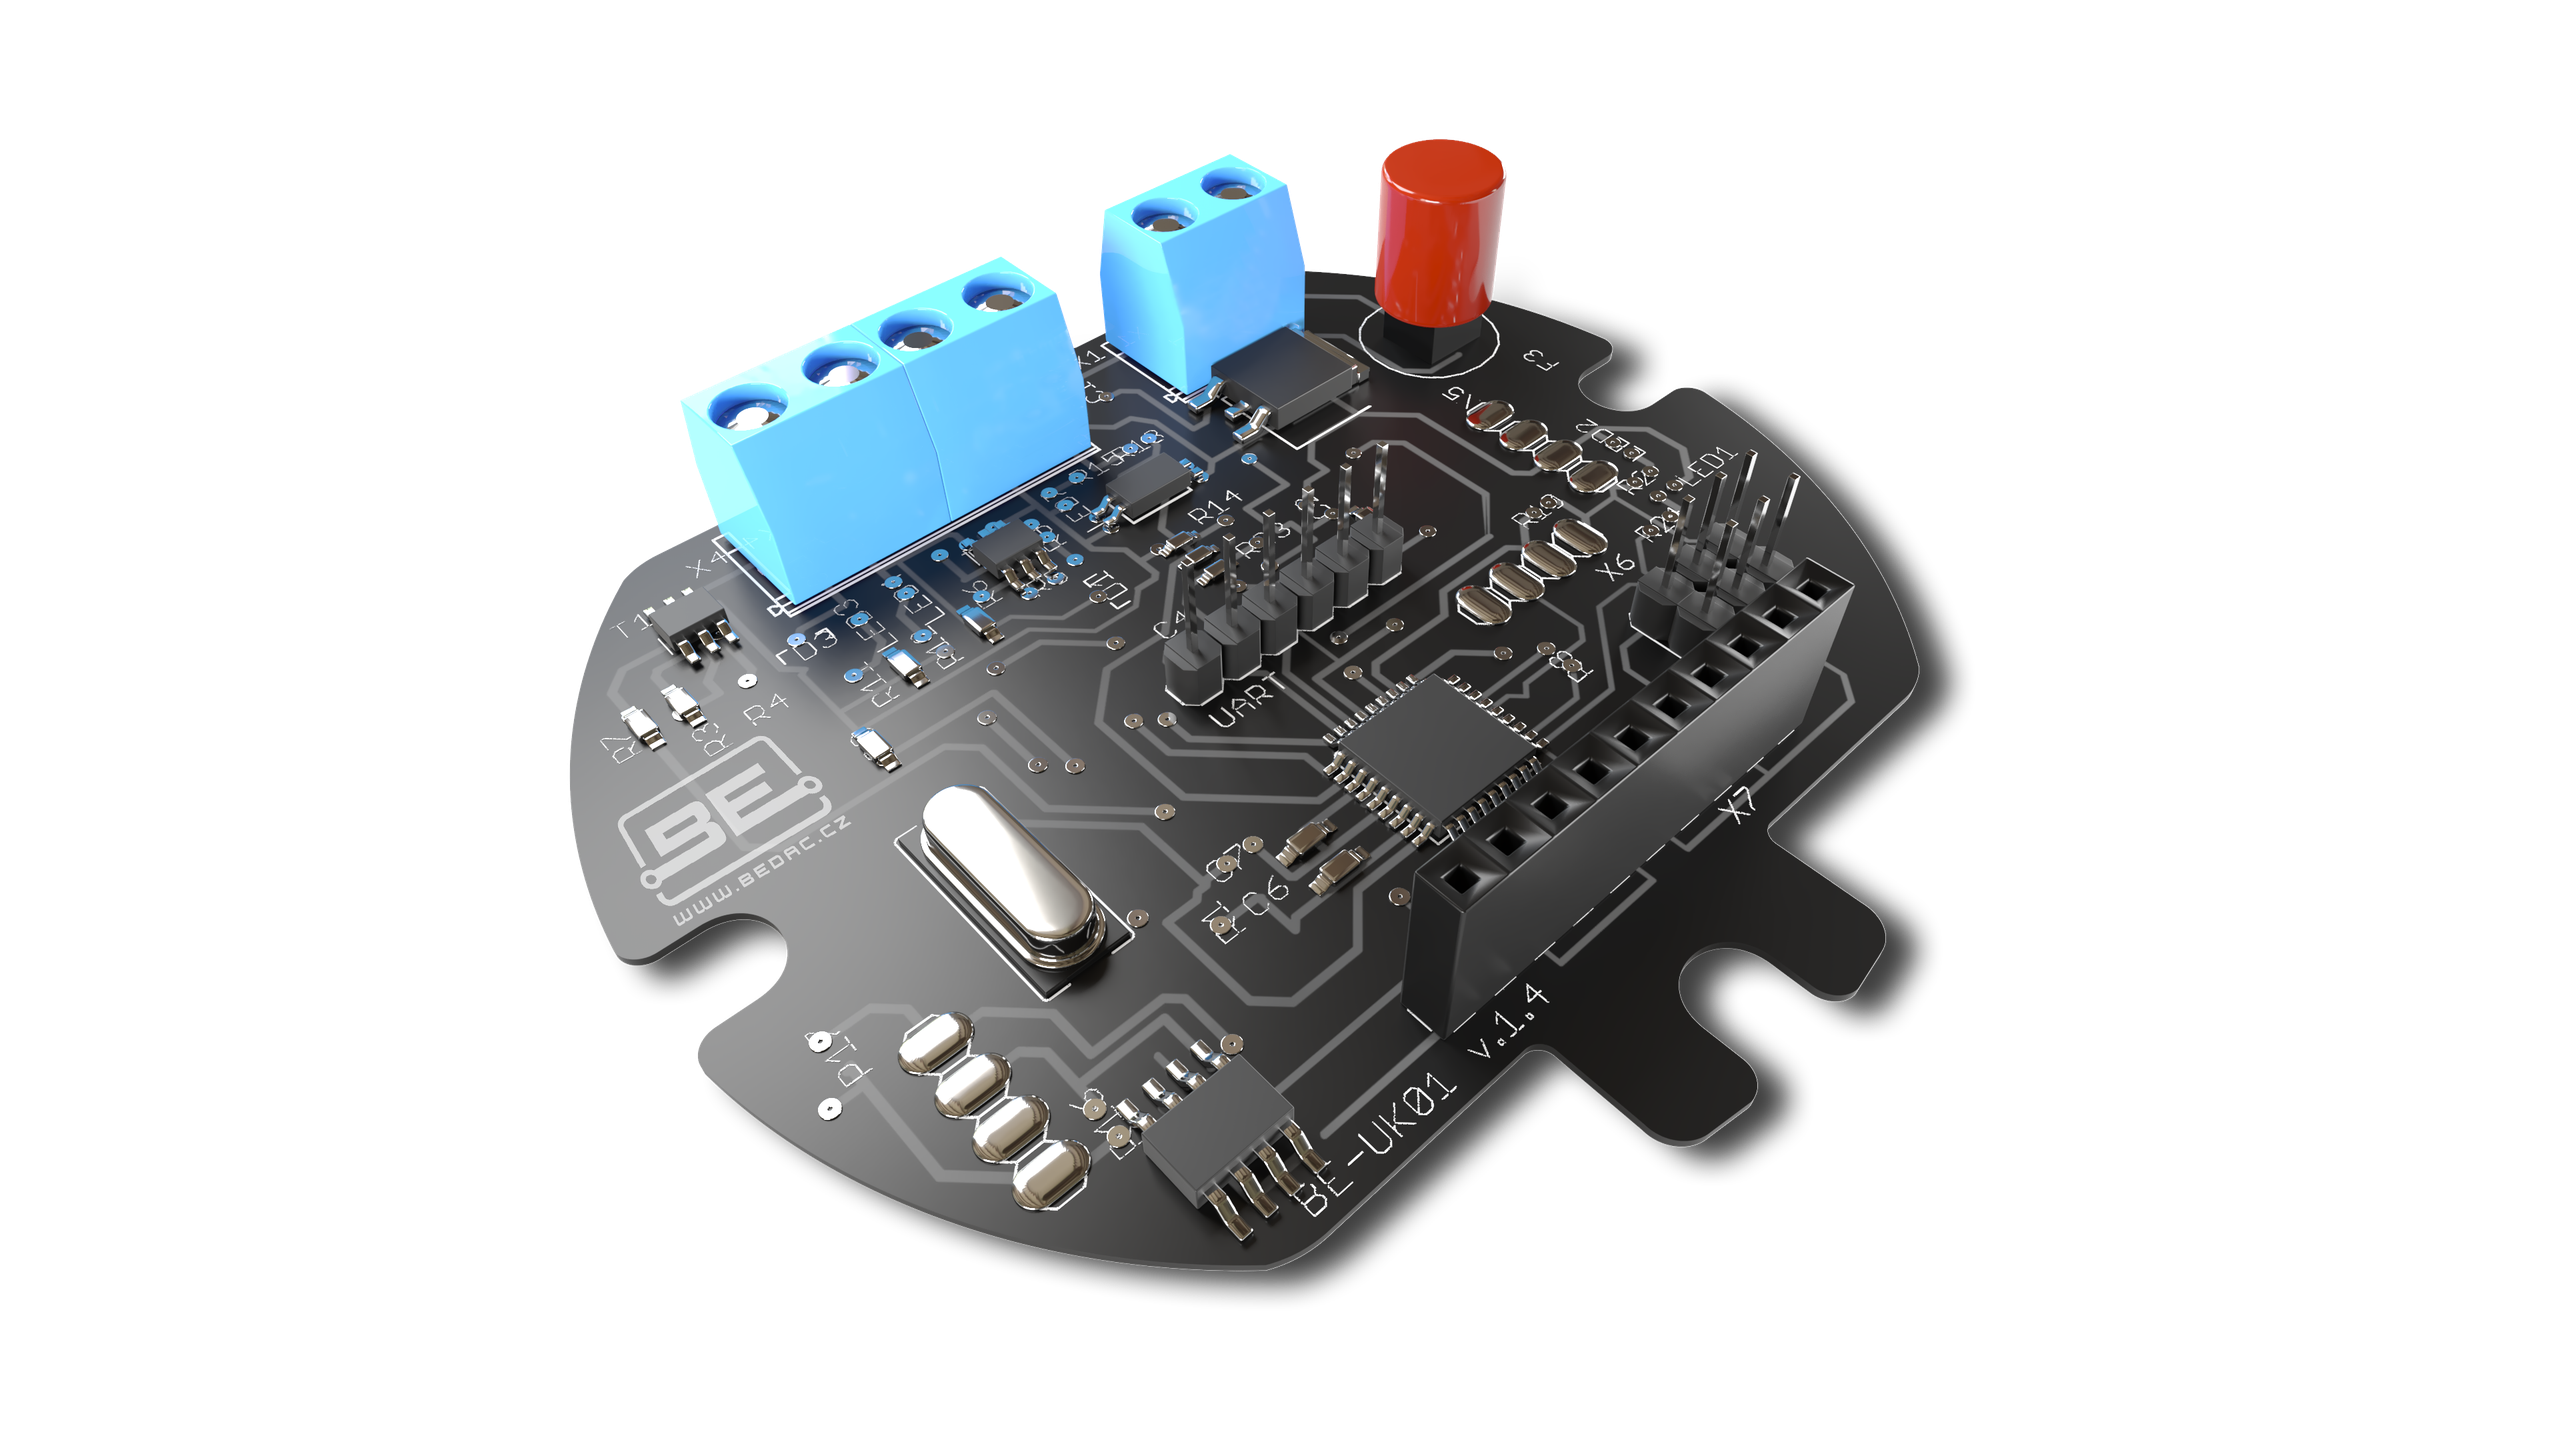 Be uk arduino universal kit from kurtroesener on tindie